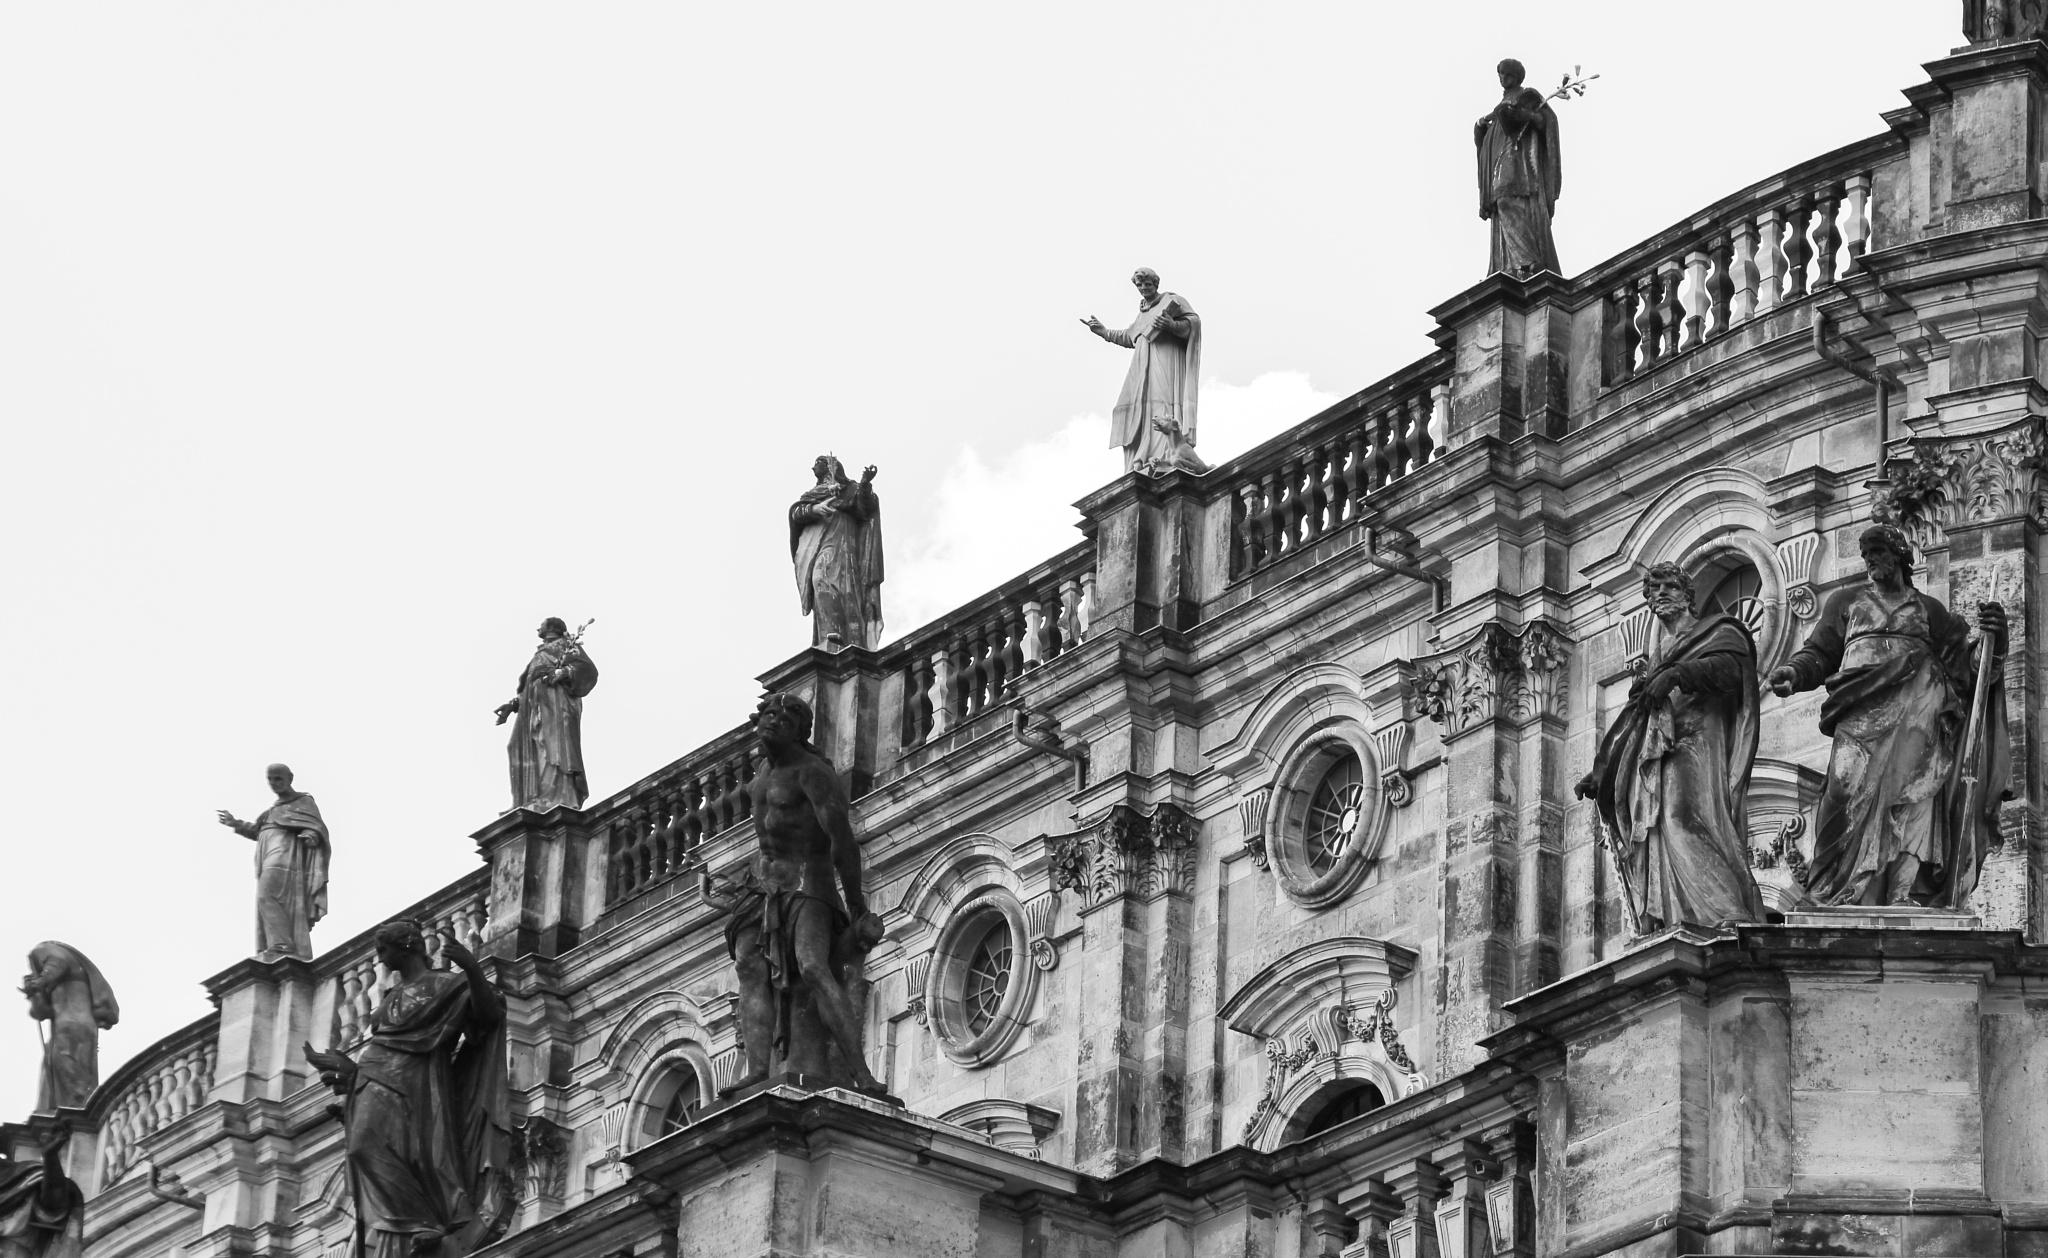 Hofkirche - Dresden  by Heidi Stenmans